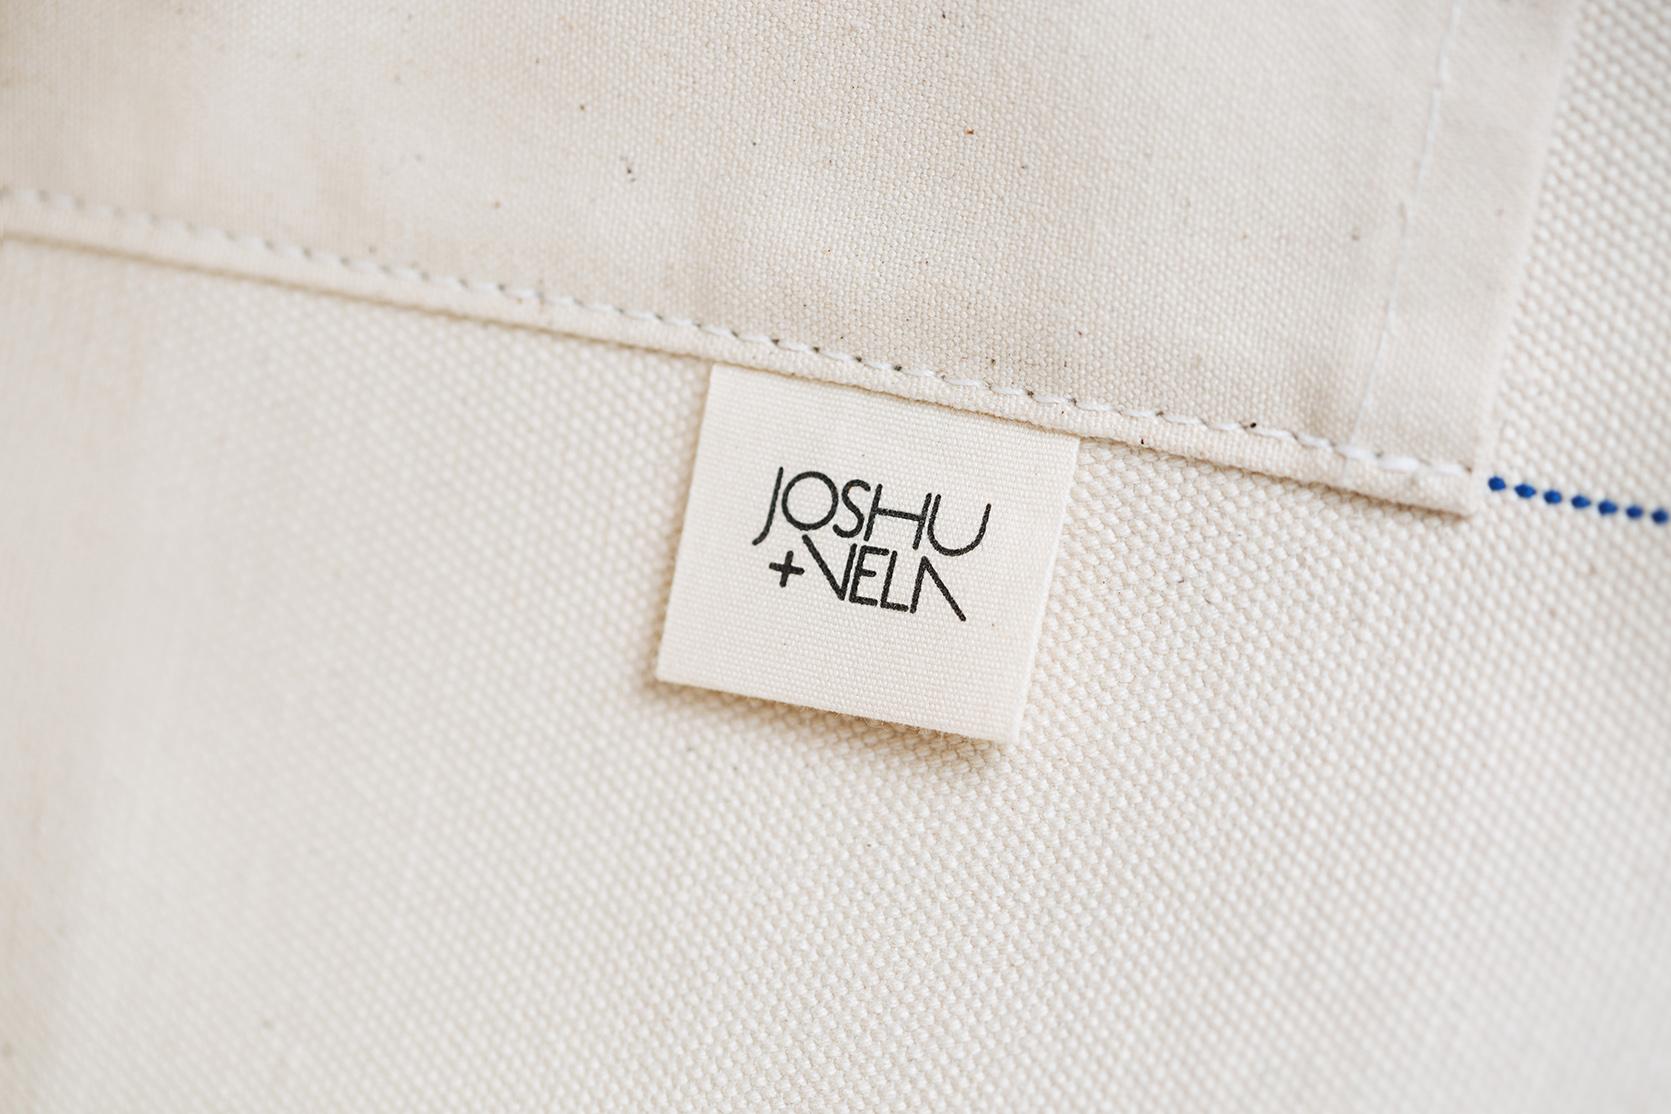 Julia-Kostreva-Studio-Branding-Joshu-Vela--Labels-Cotton-1.jpg